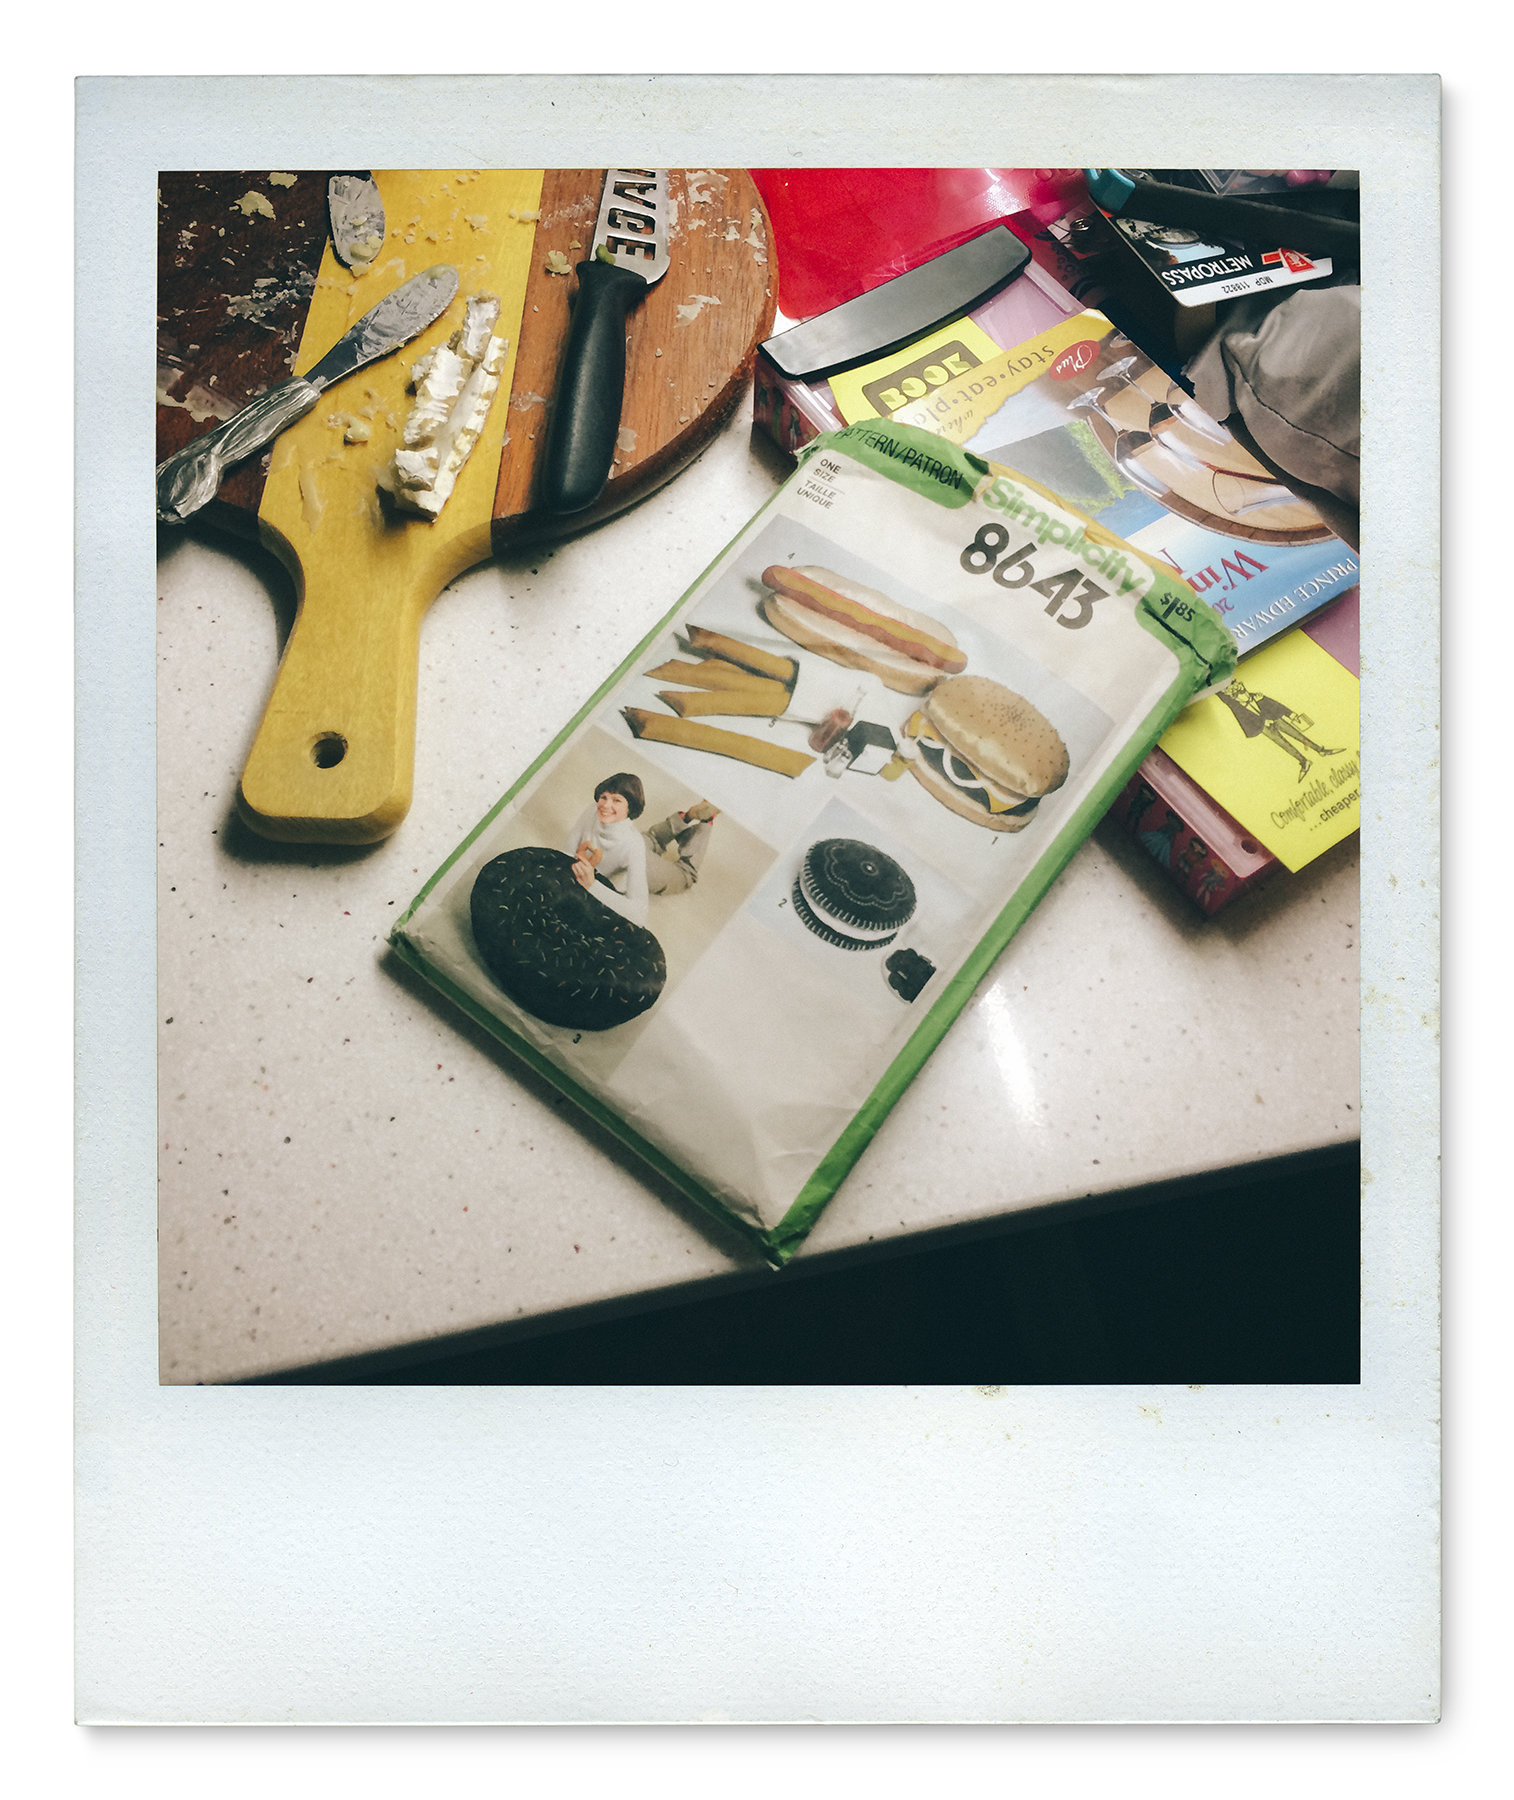 068_Polaroid SX70_IMG_8848.jpg